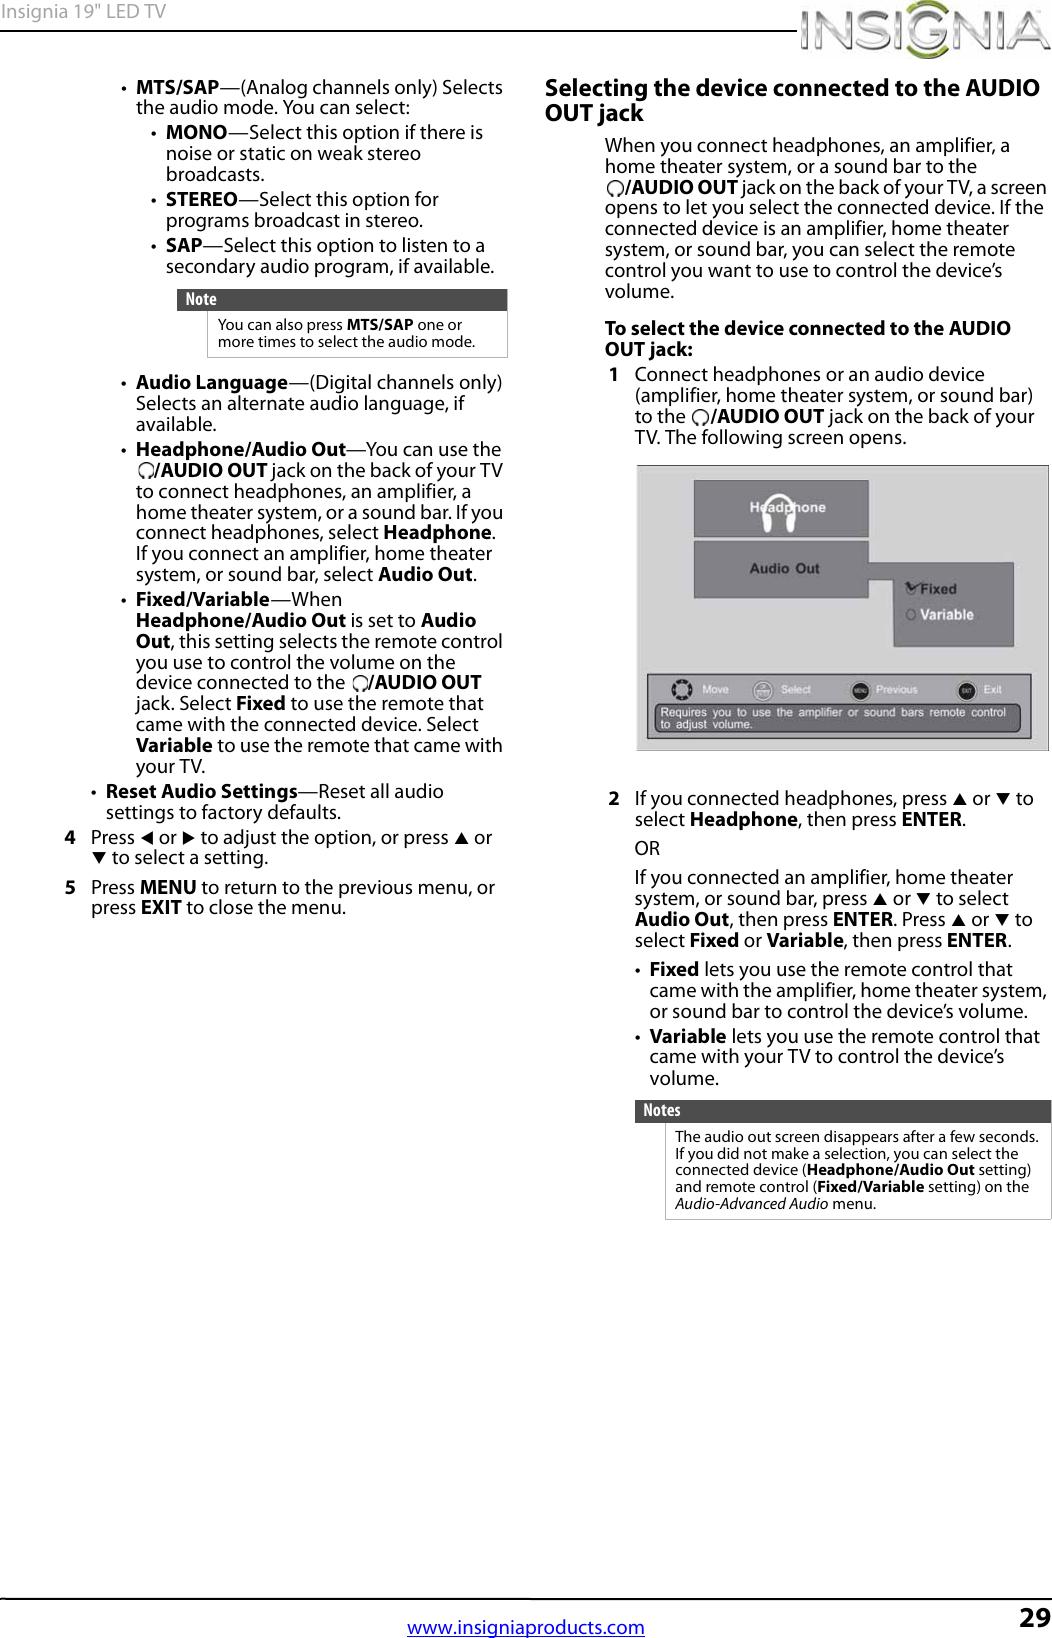 Insignia Ns 19E310A13 Owner S Manual